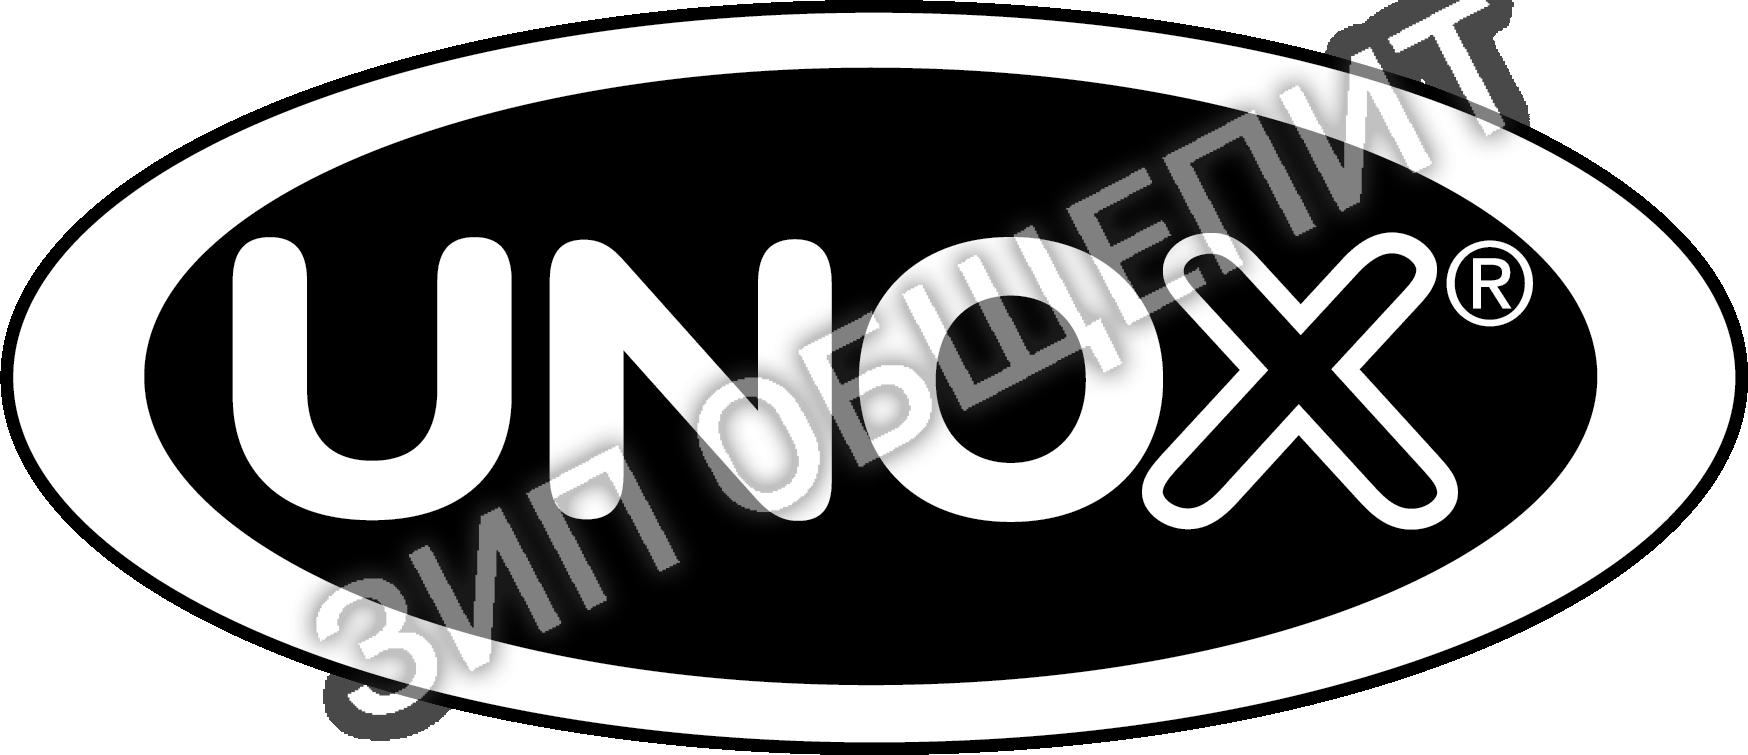 Втулка VM2349A0 для пароконвектомата UNOX модели XEVC-0511-E1R